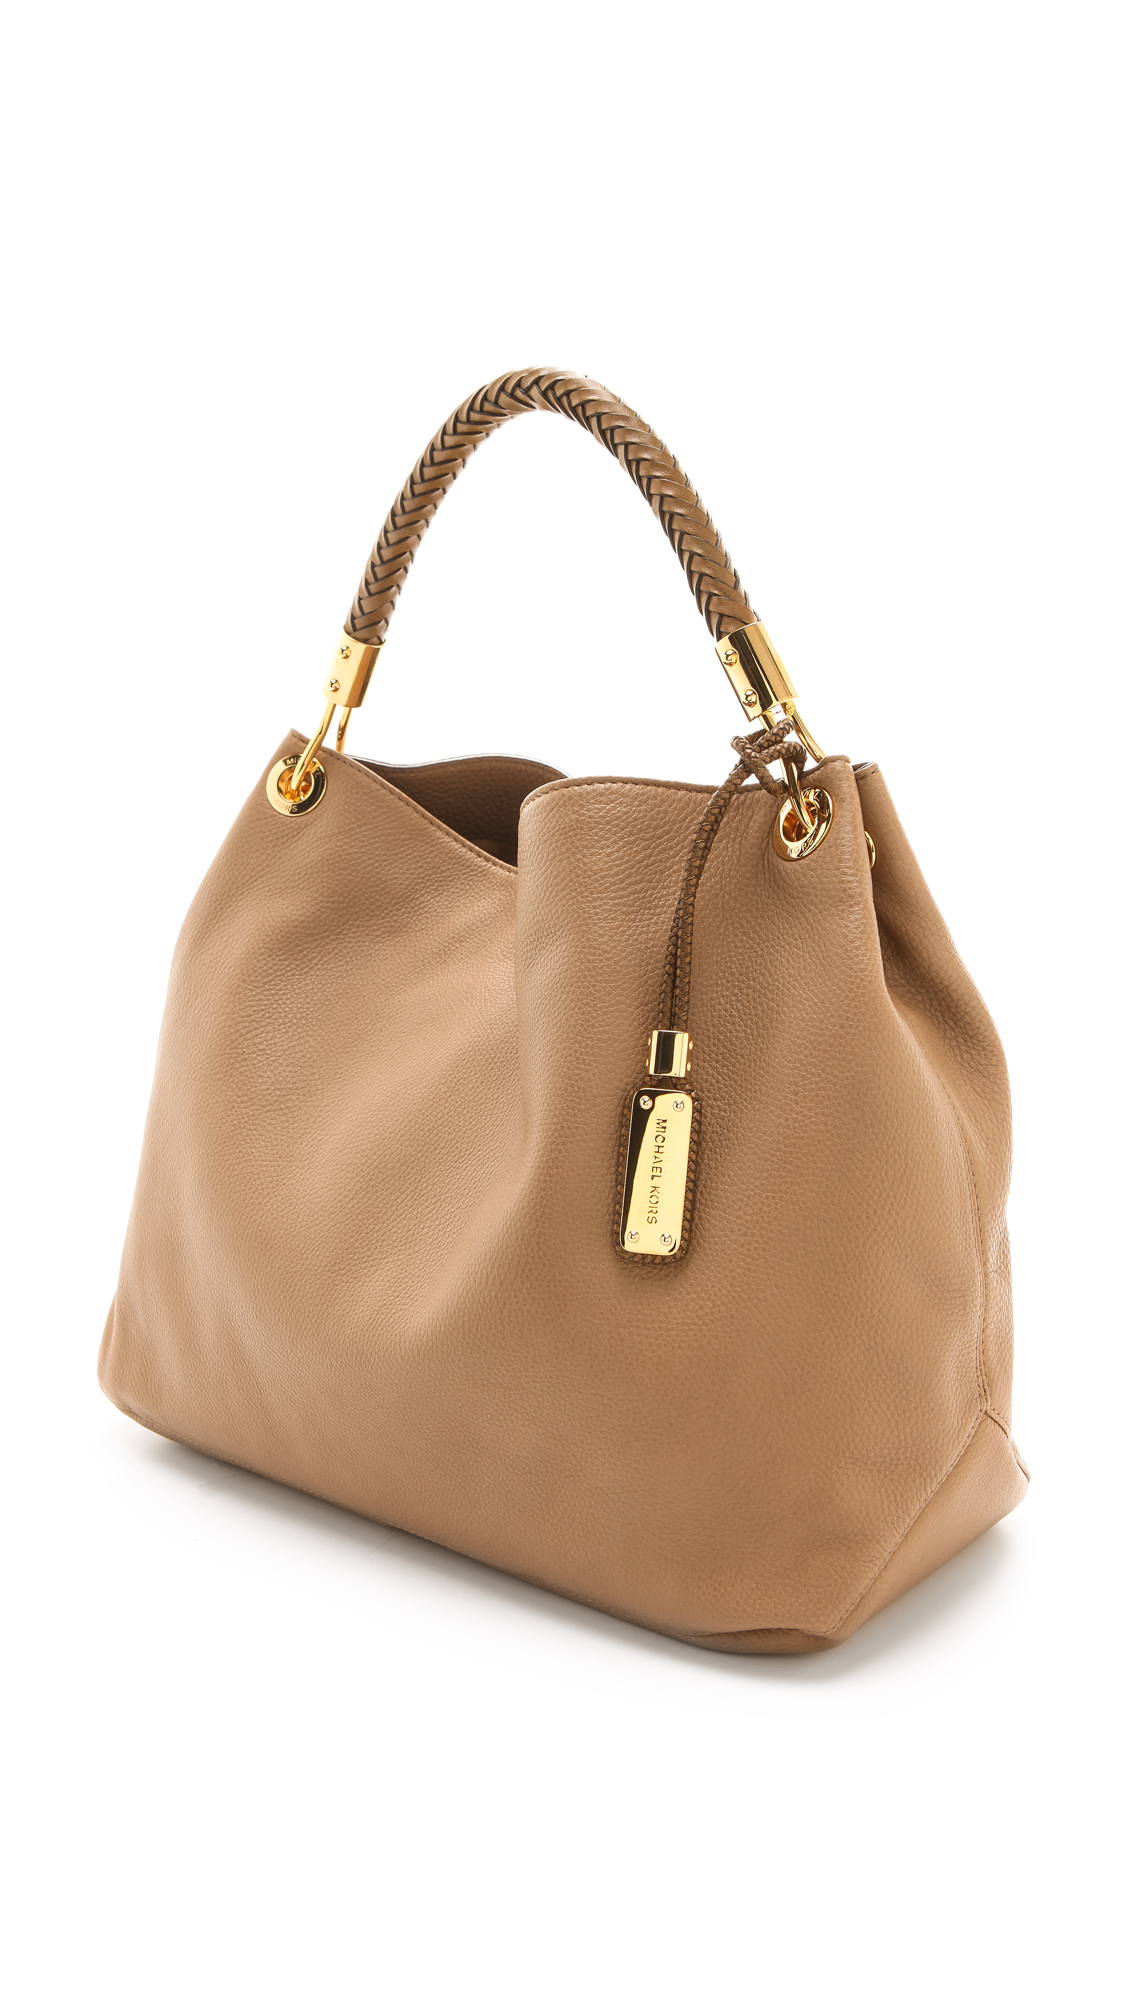 233b37a3fe78 Michael Kors Skorpios Large Shoulder Bag in Brown - Lyst